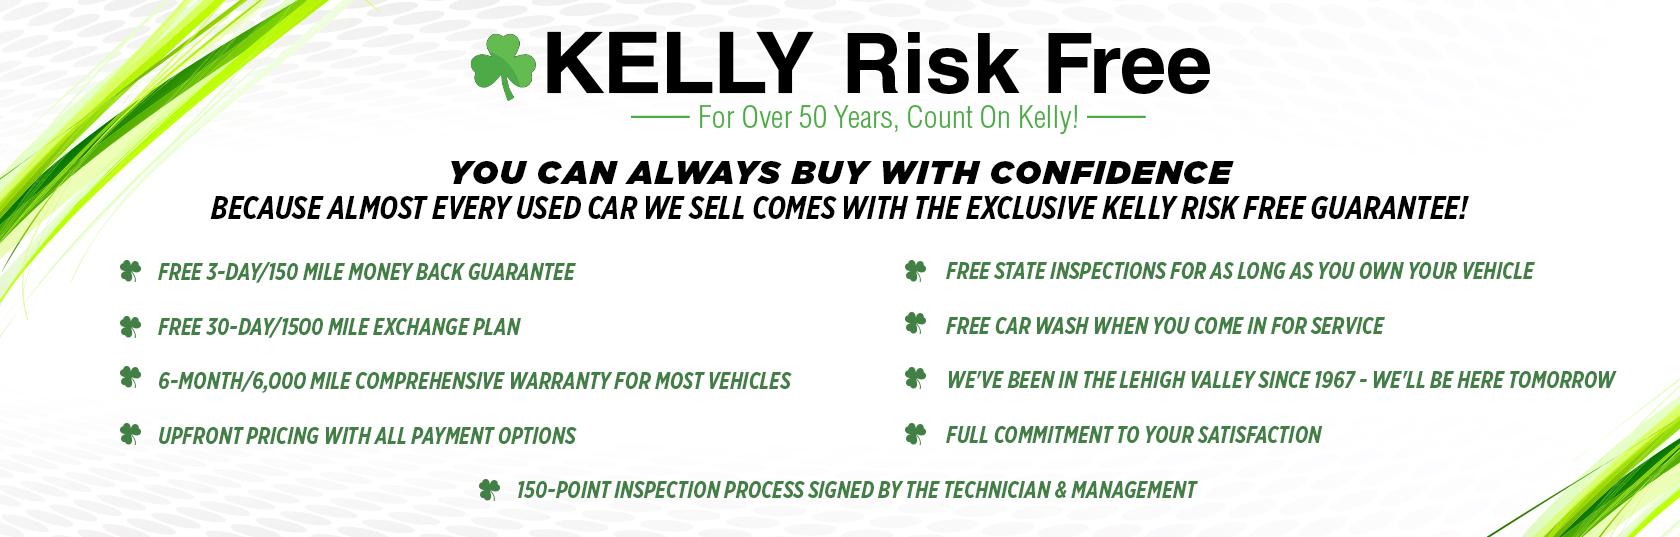 Kelly Risk Free Guarantee Kelly Chrysler Jeep Dodge Ram